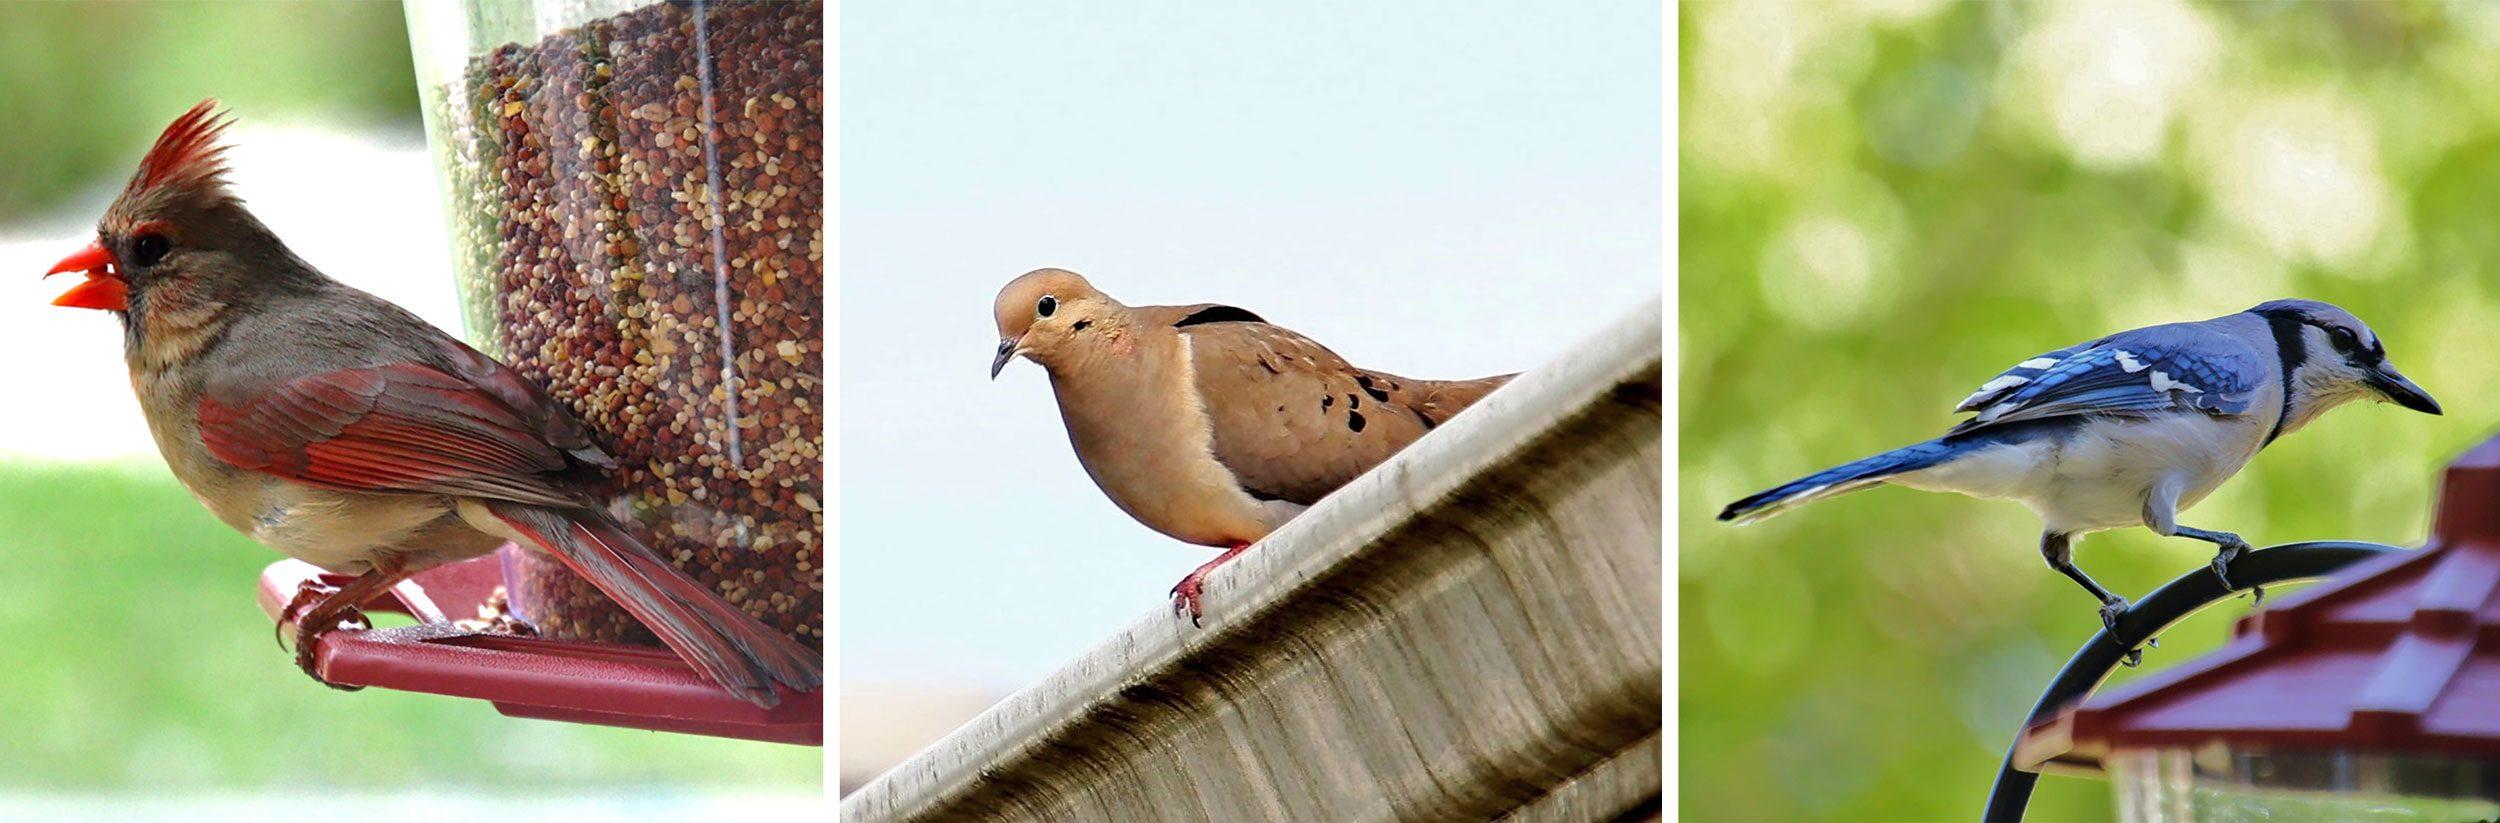 photos of birds by Joe Hall